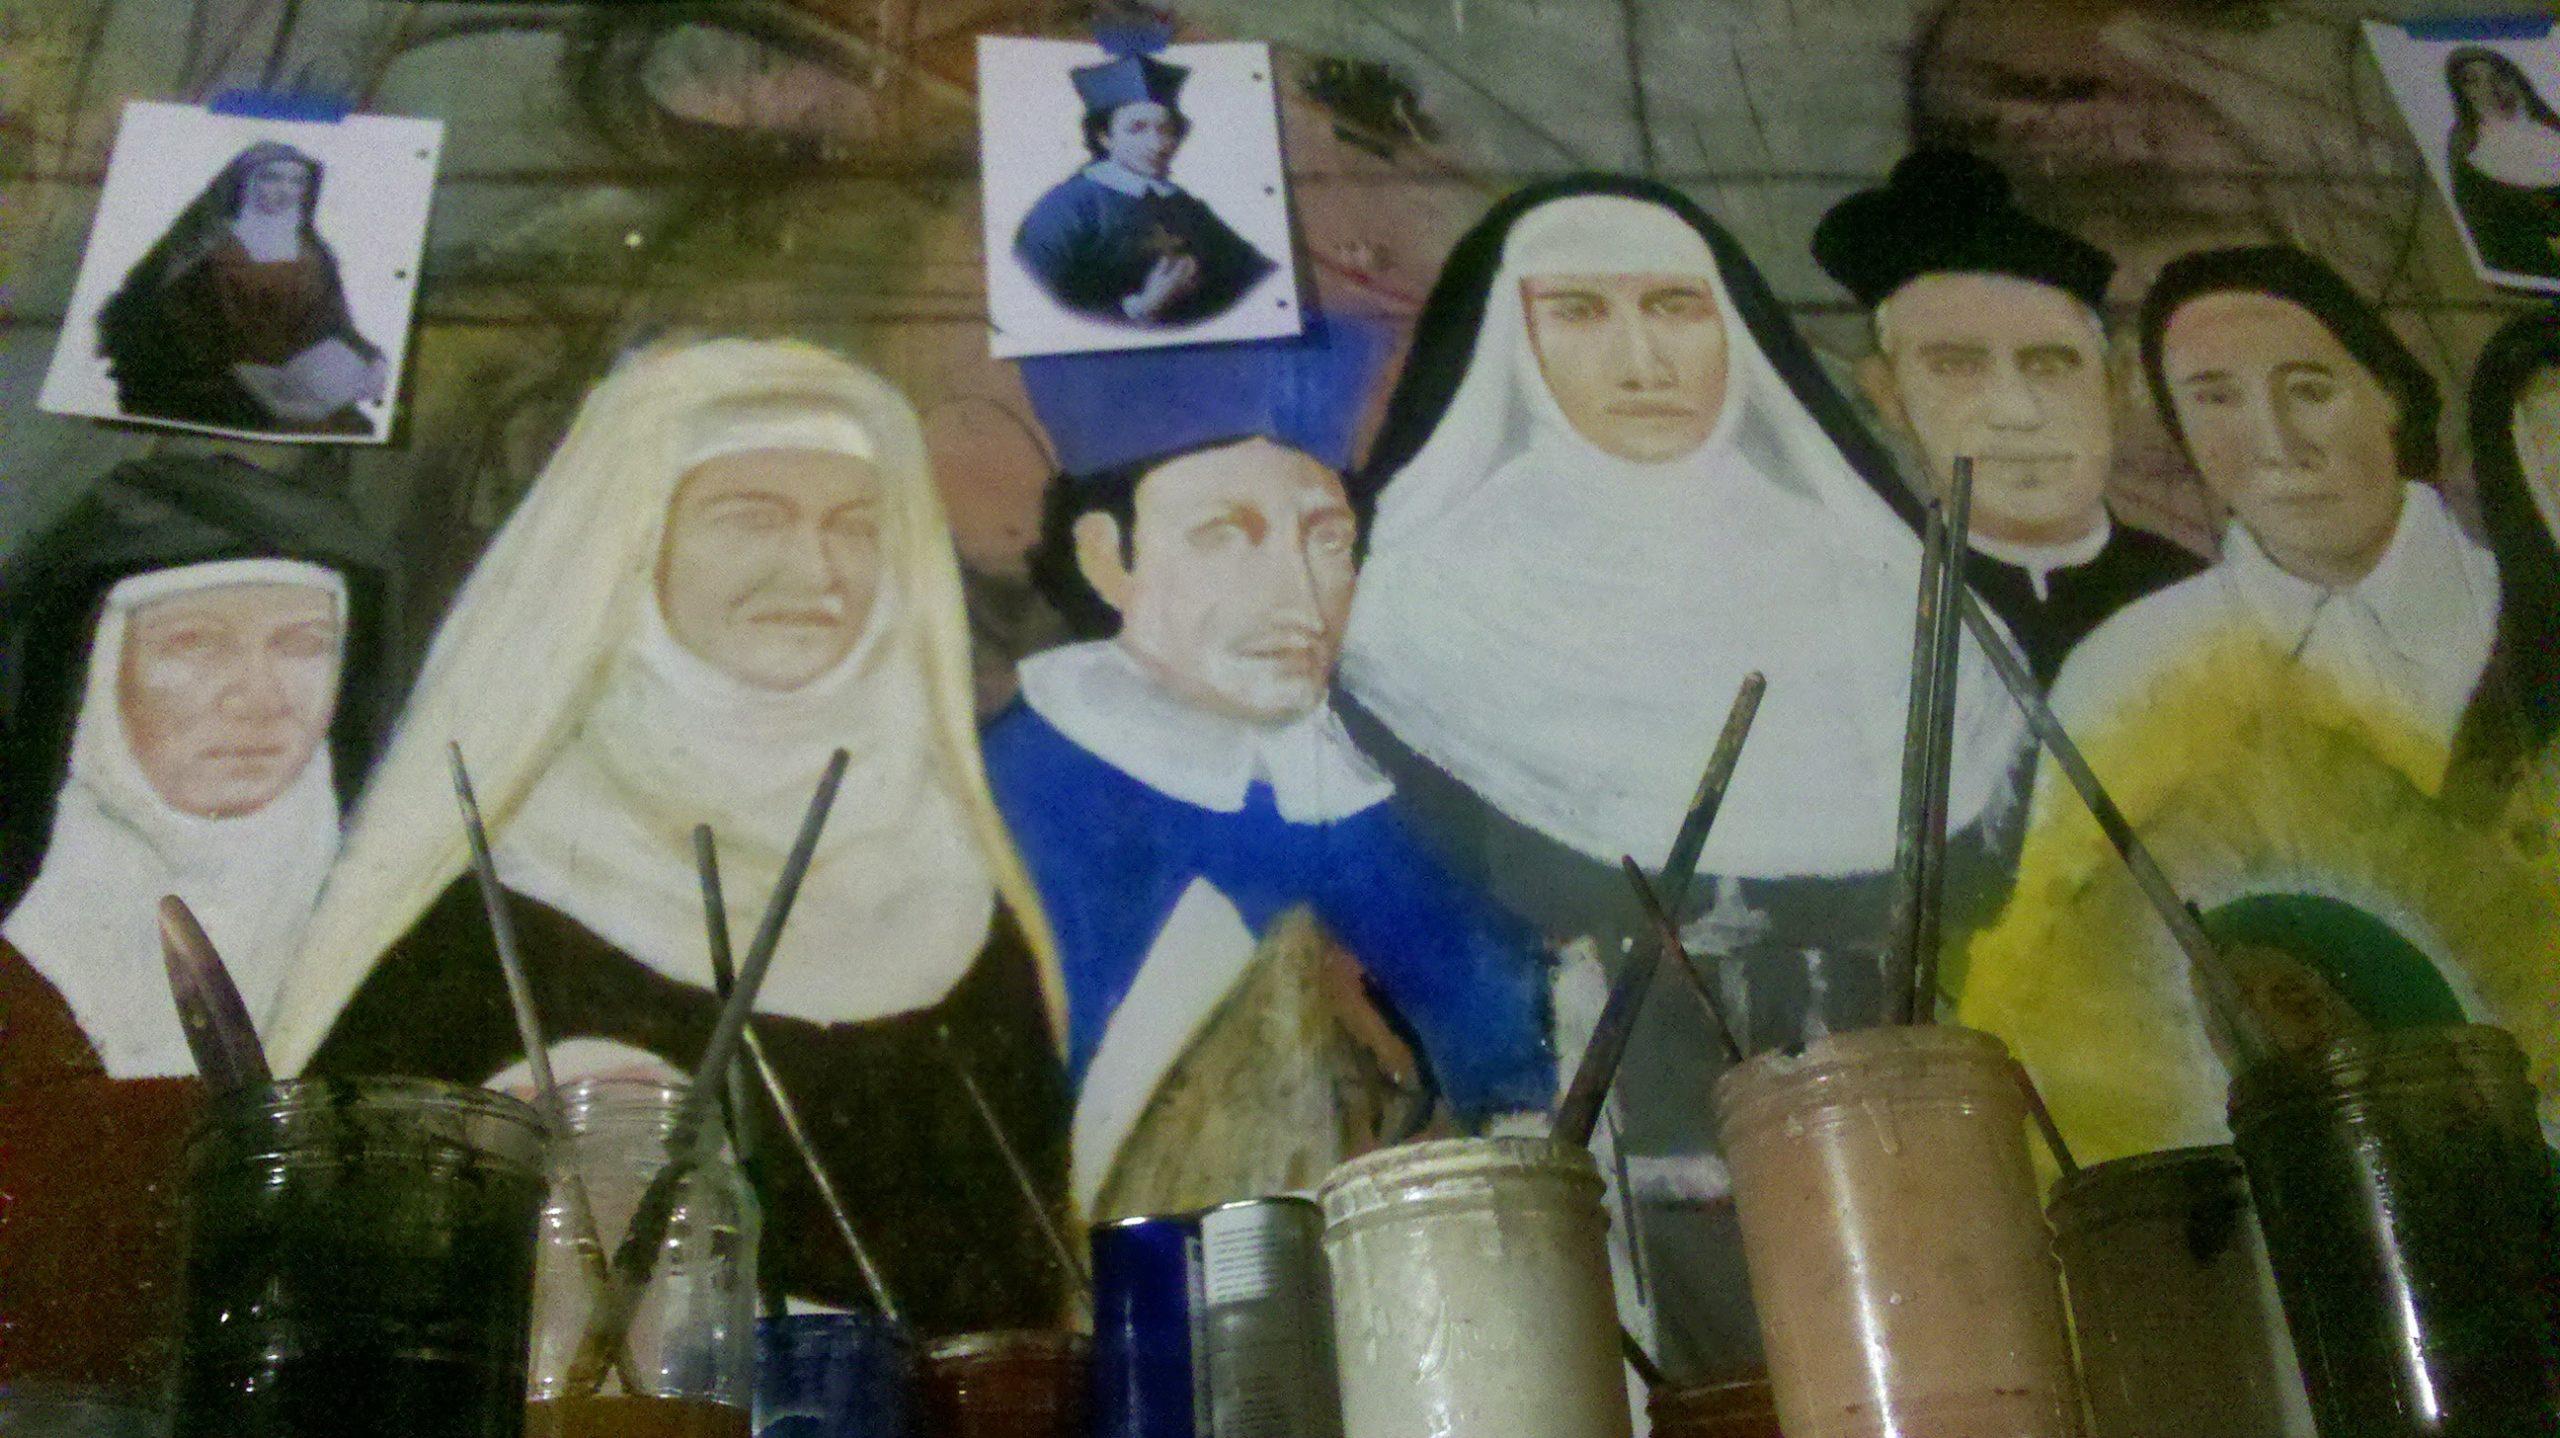 Sacred Historians Mural